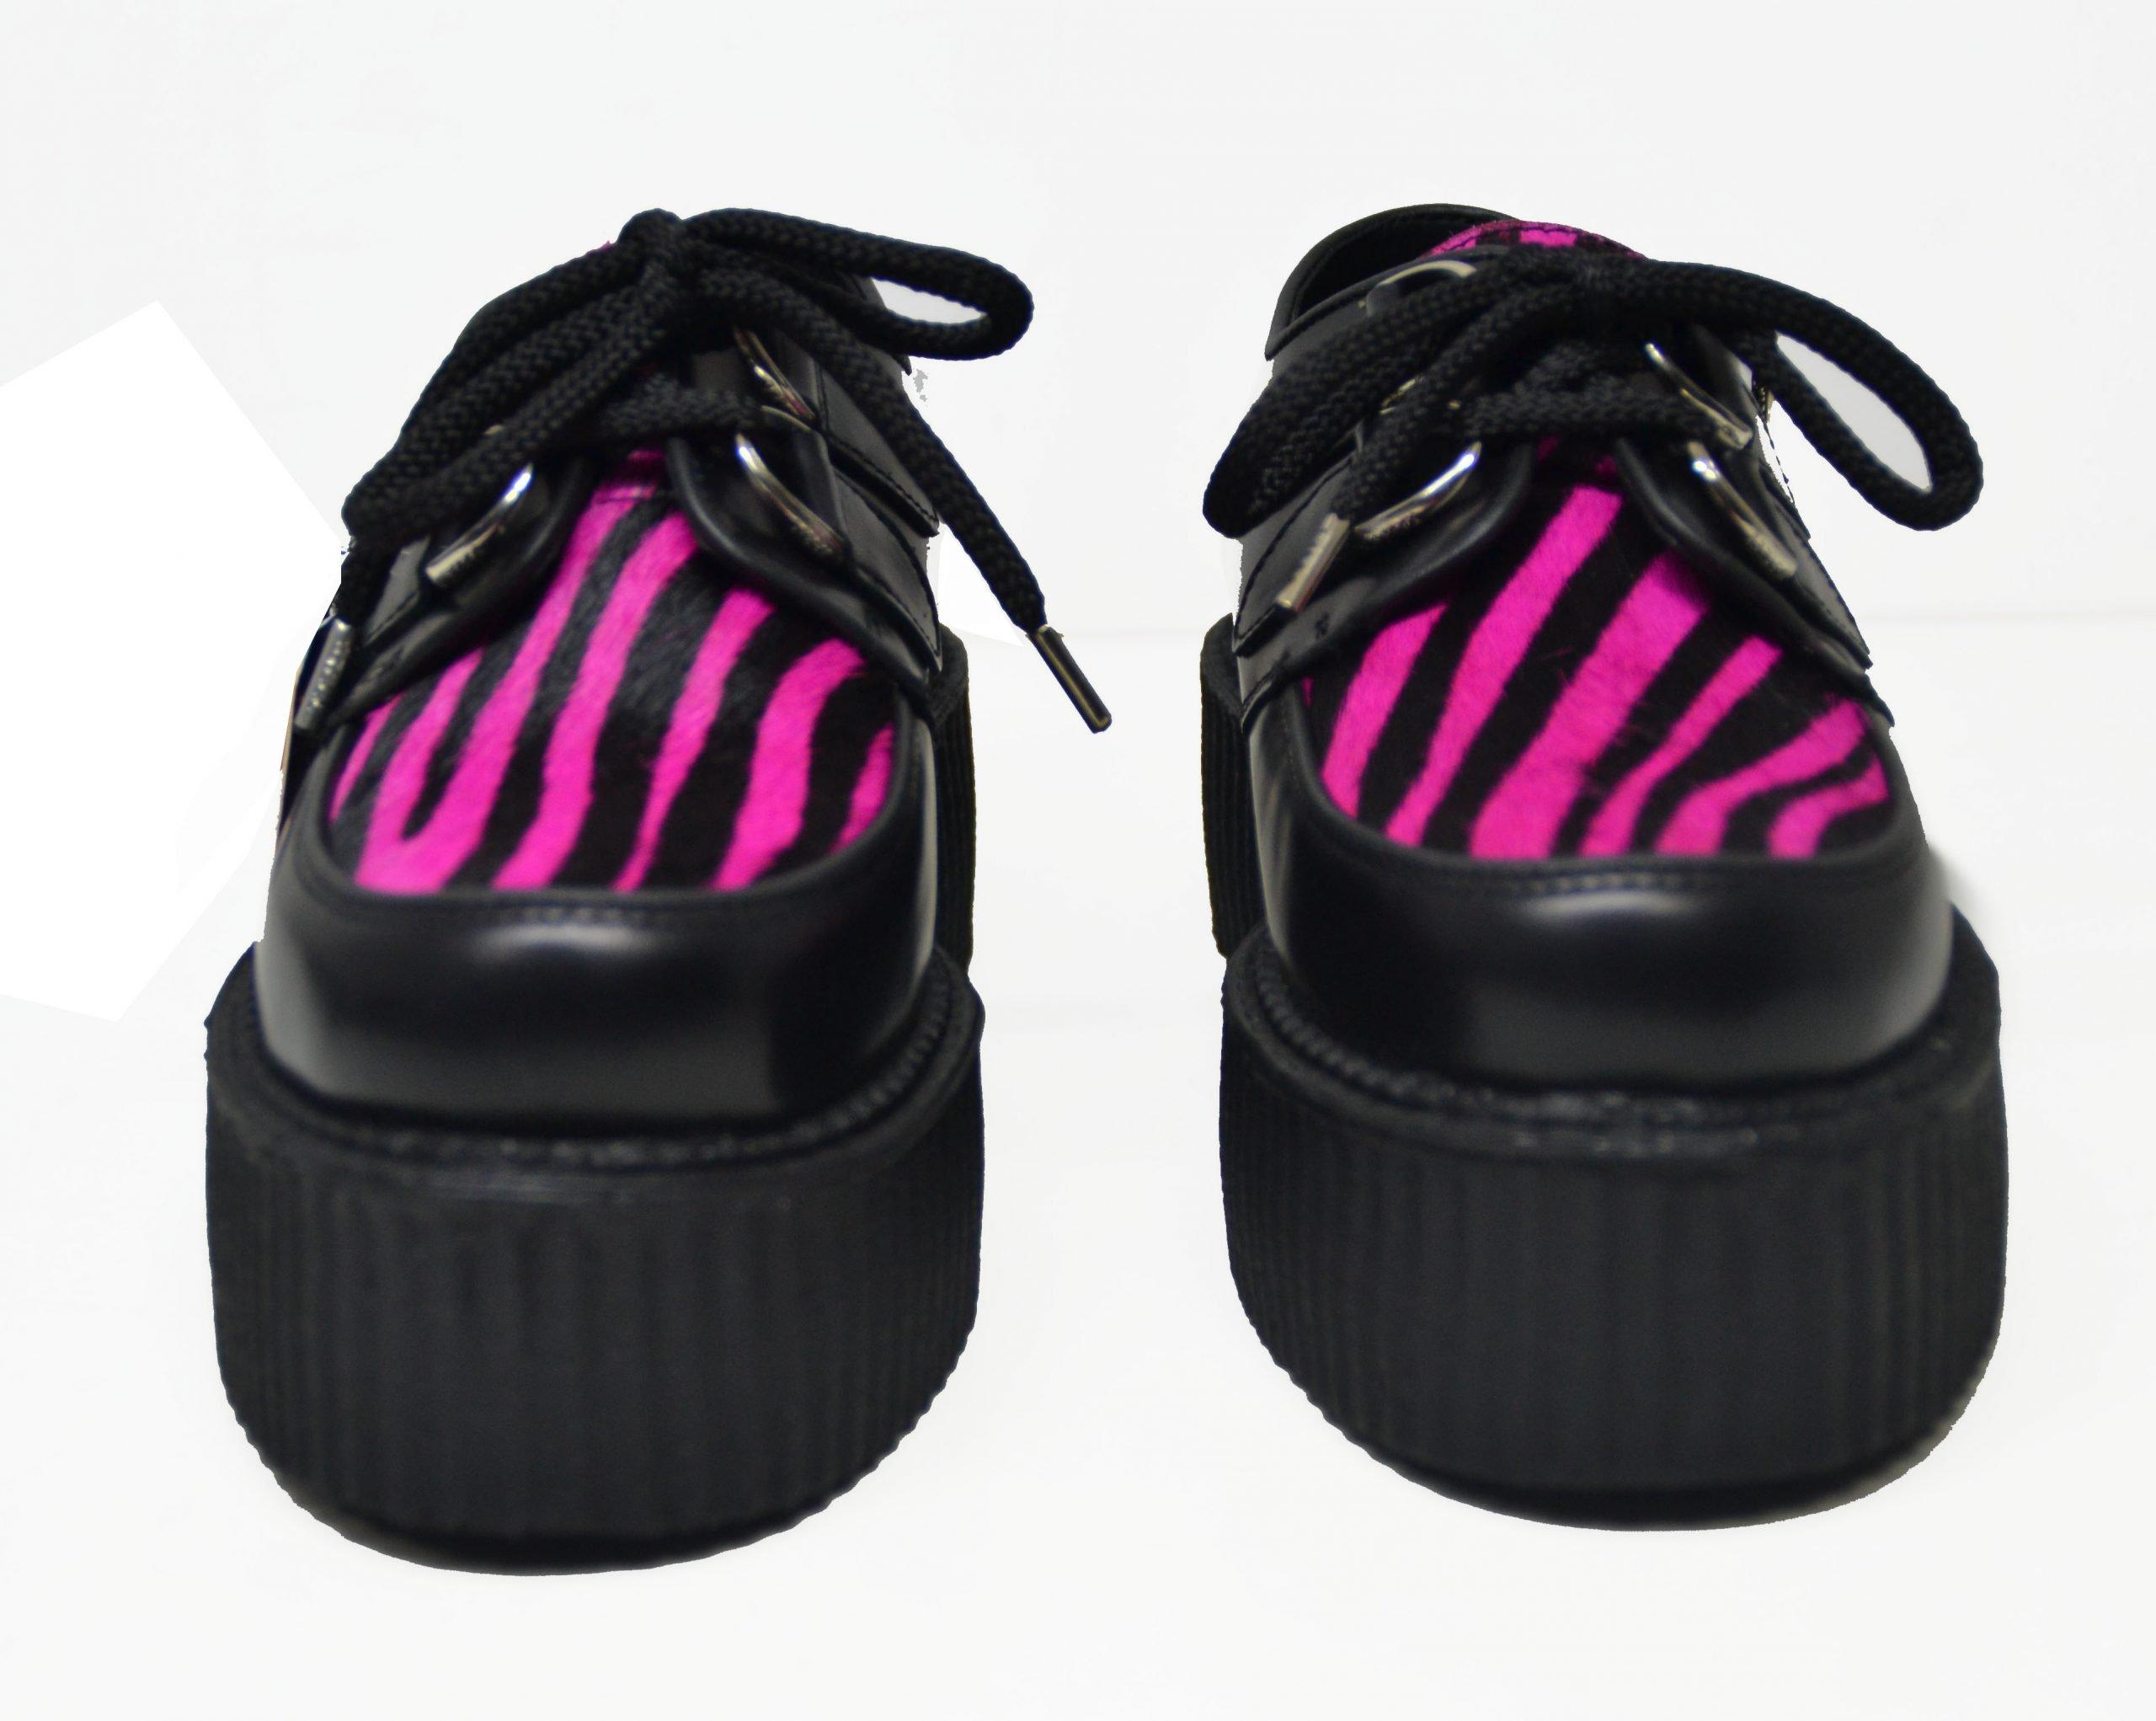 Double creeper shoe